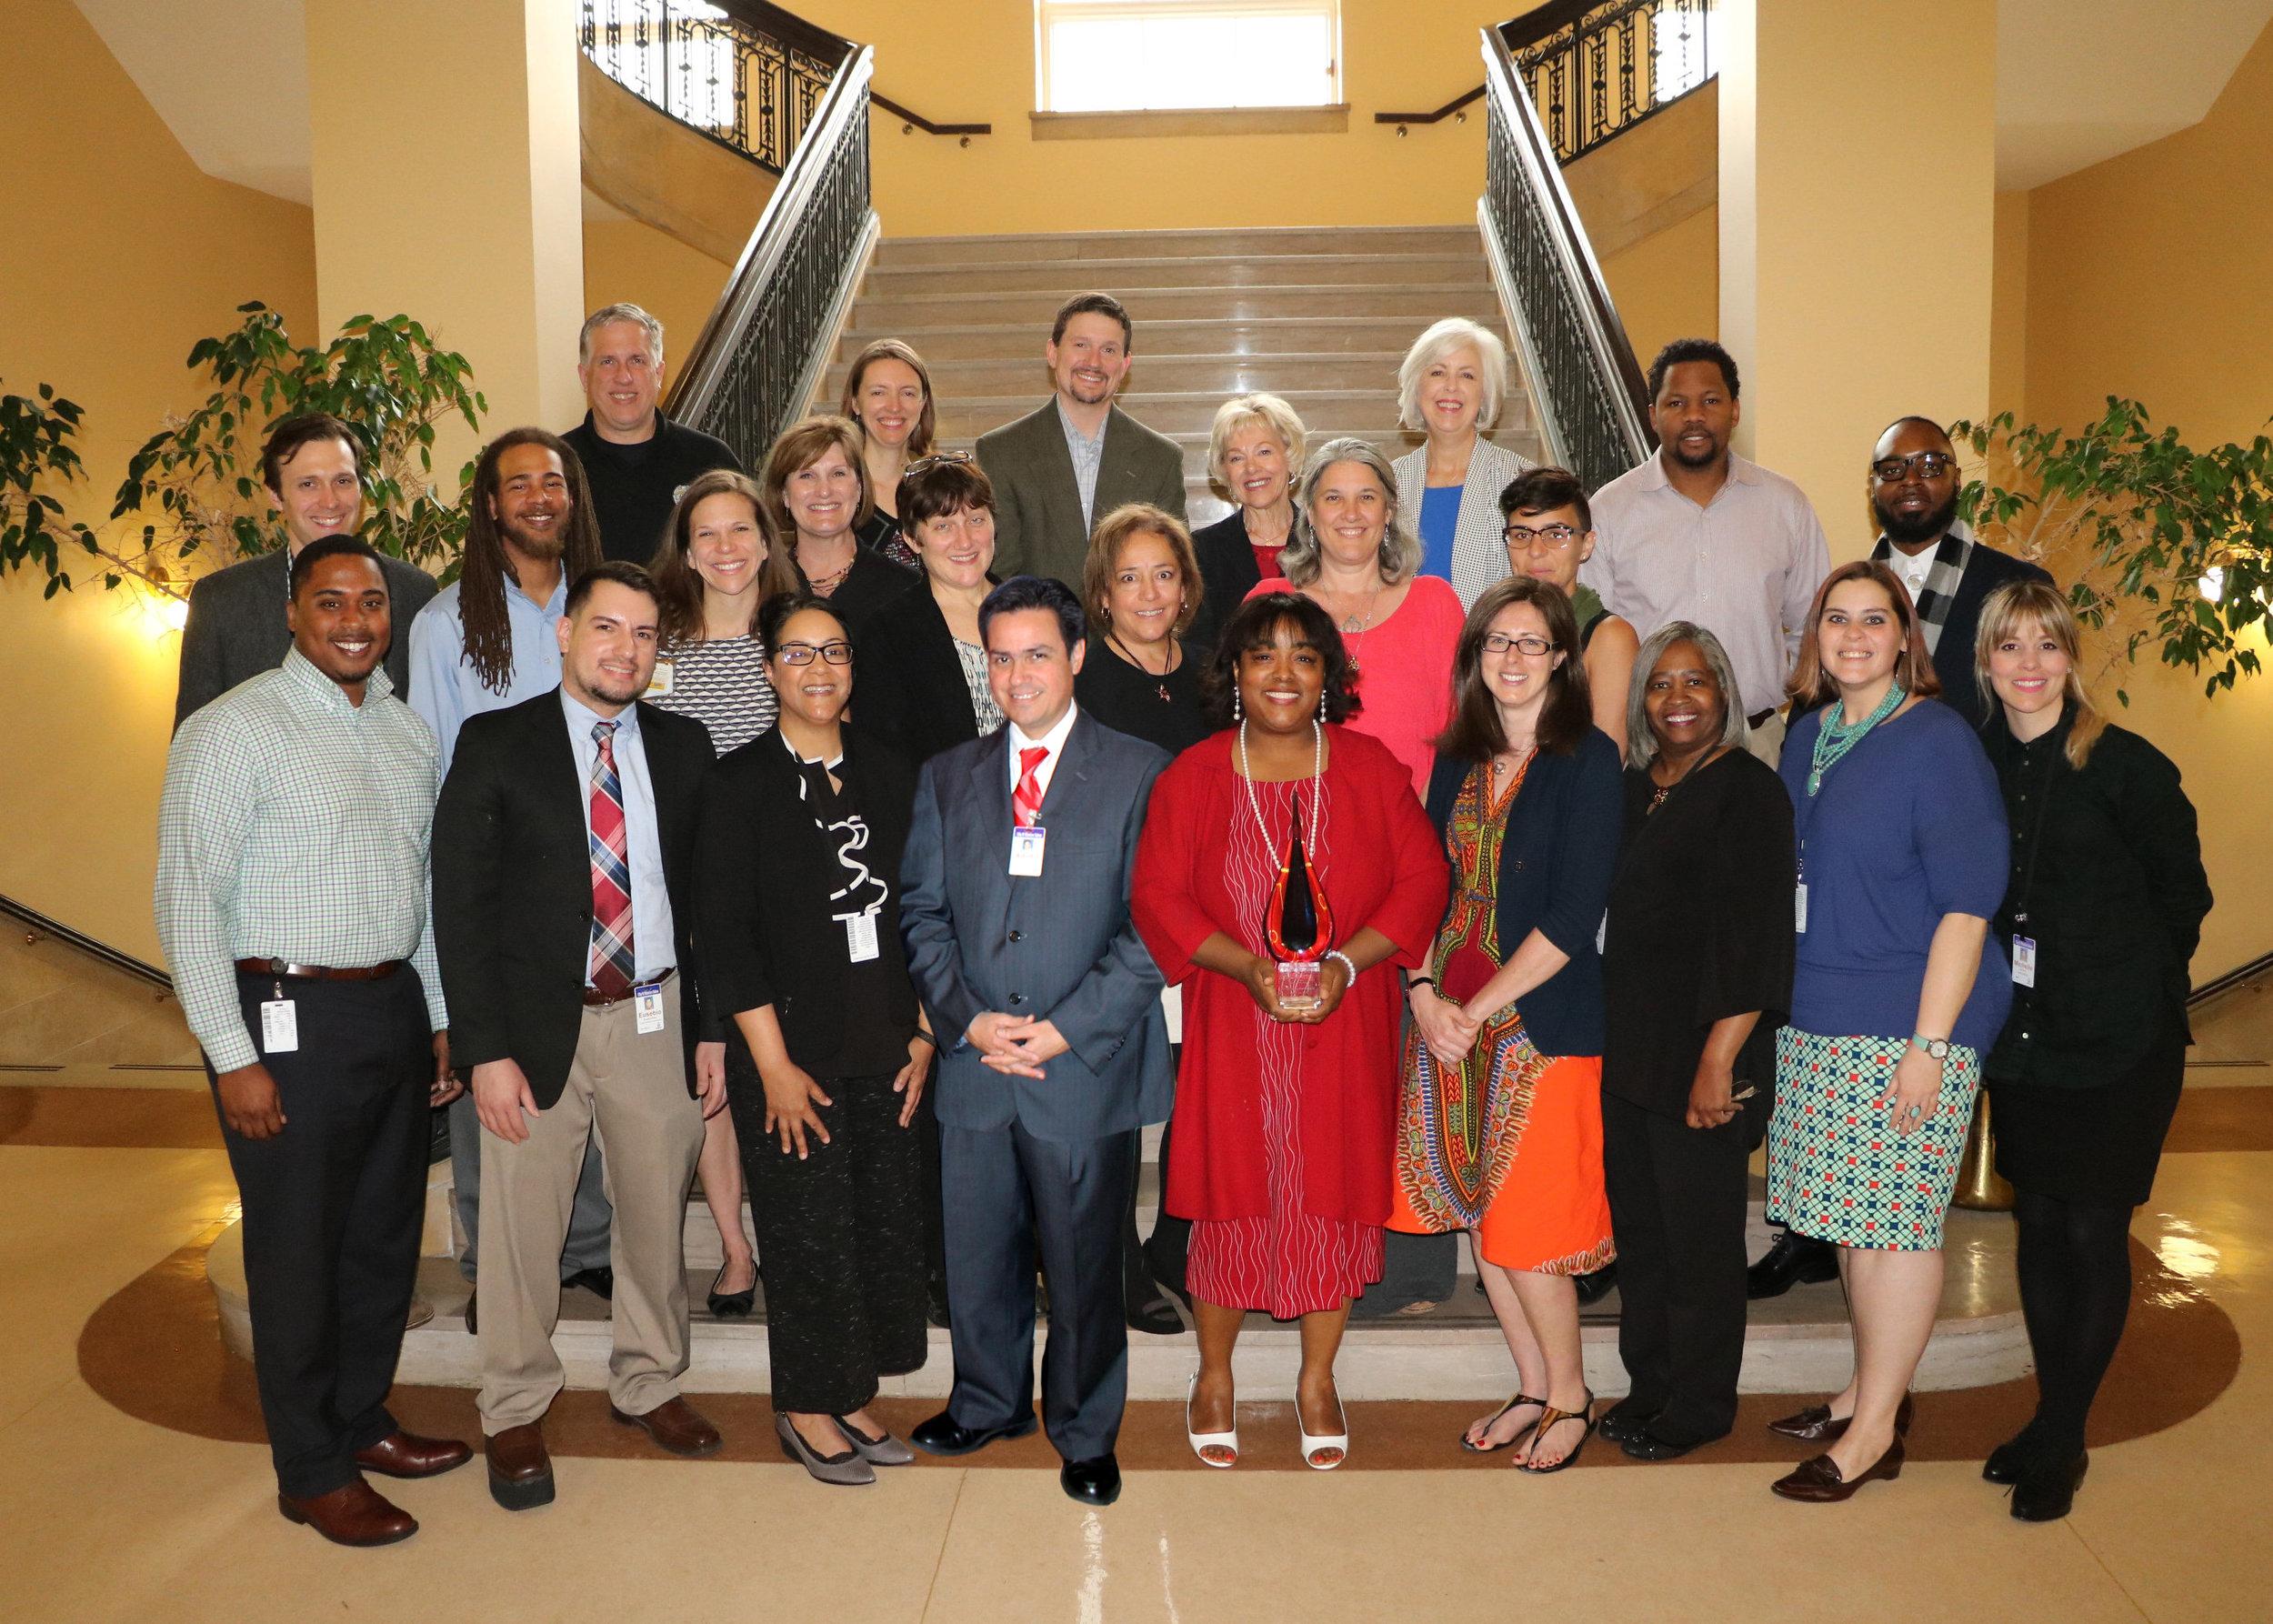 2017 Winston-Salem Building Integrated Communities Stakeholder Committee